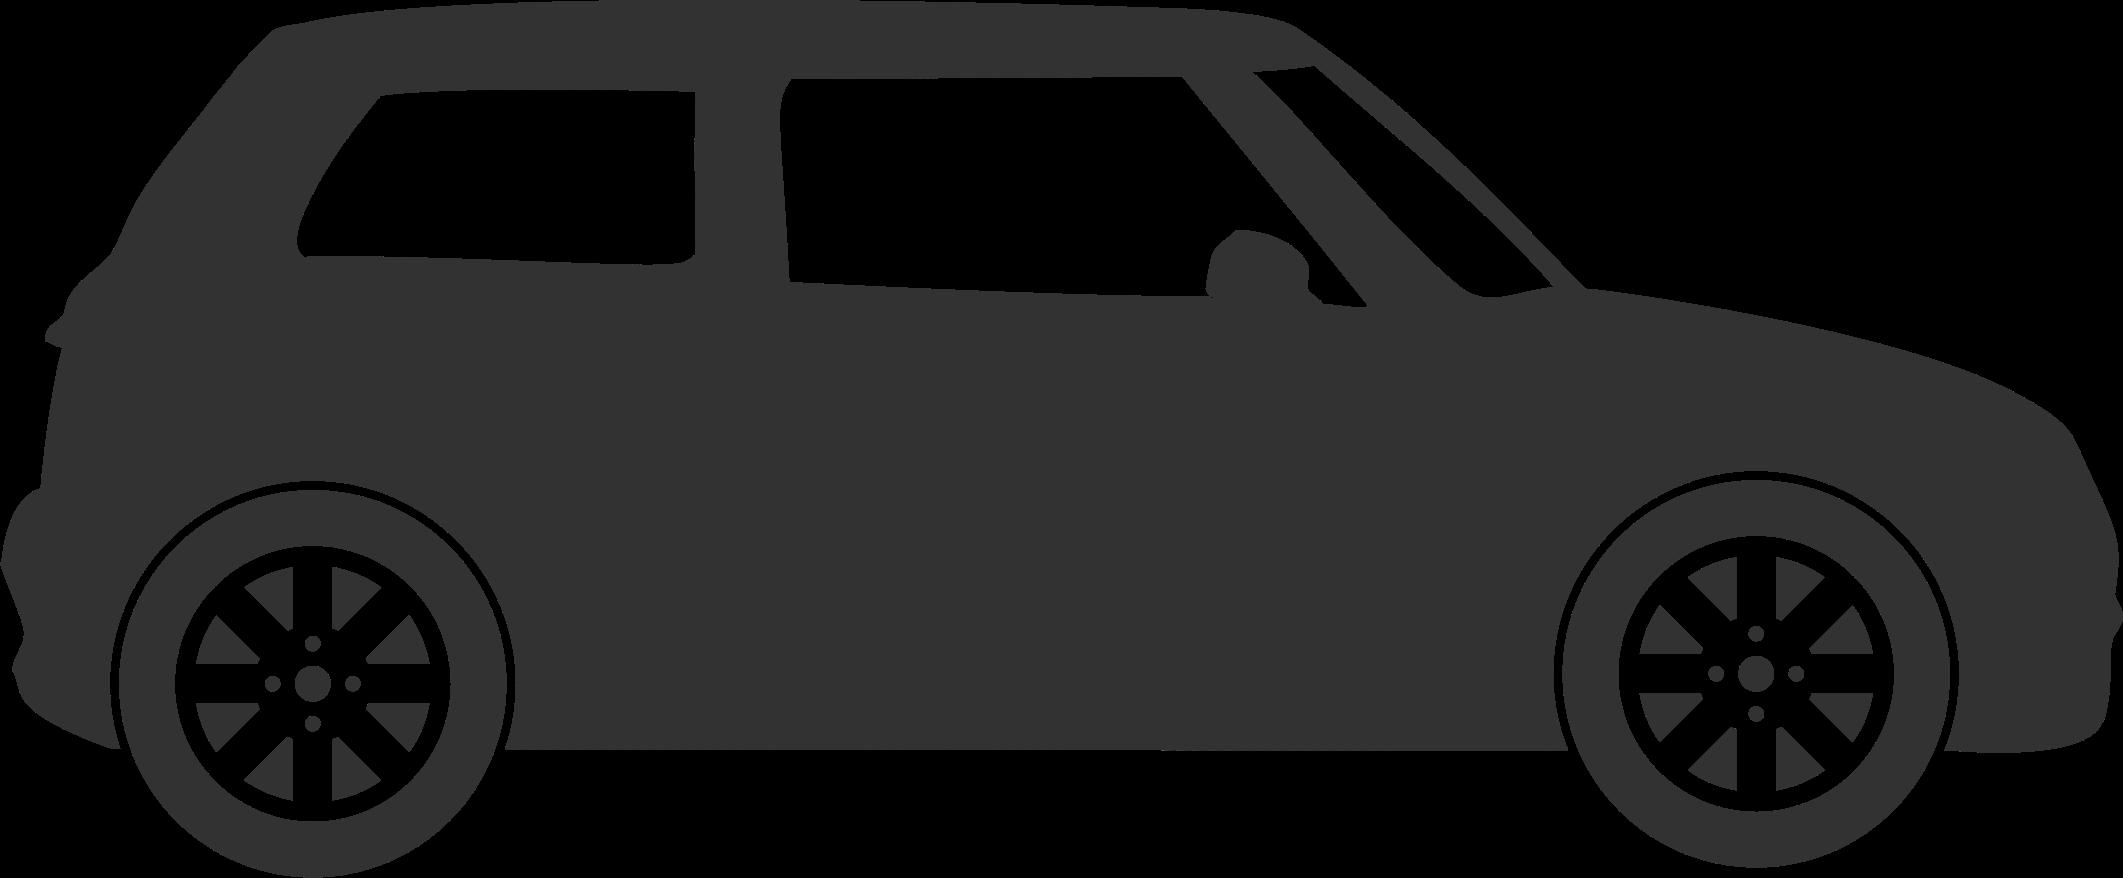 Car Clipart Jpg & Free Clip Art Images #28611.